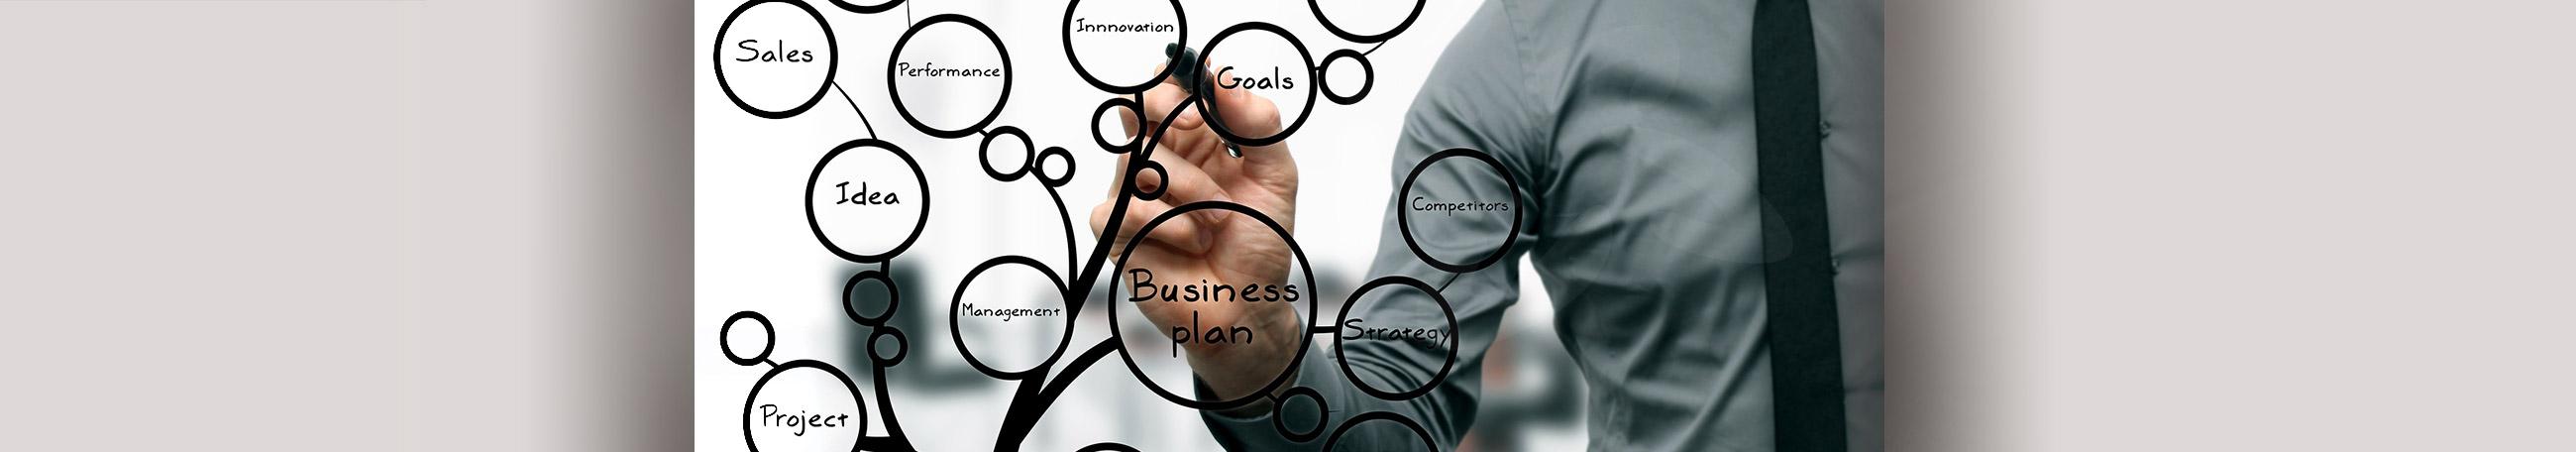 slider-bg-1-business-process